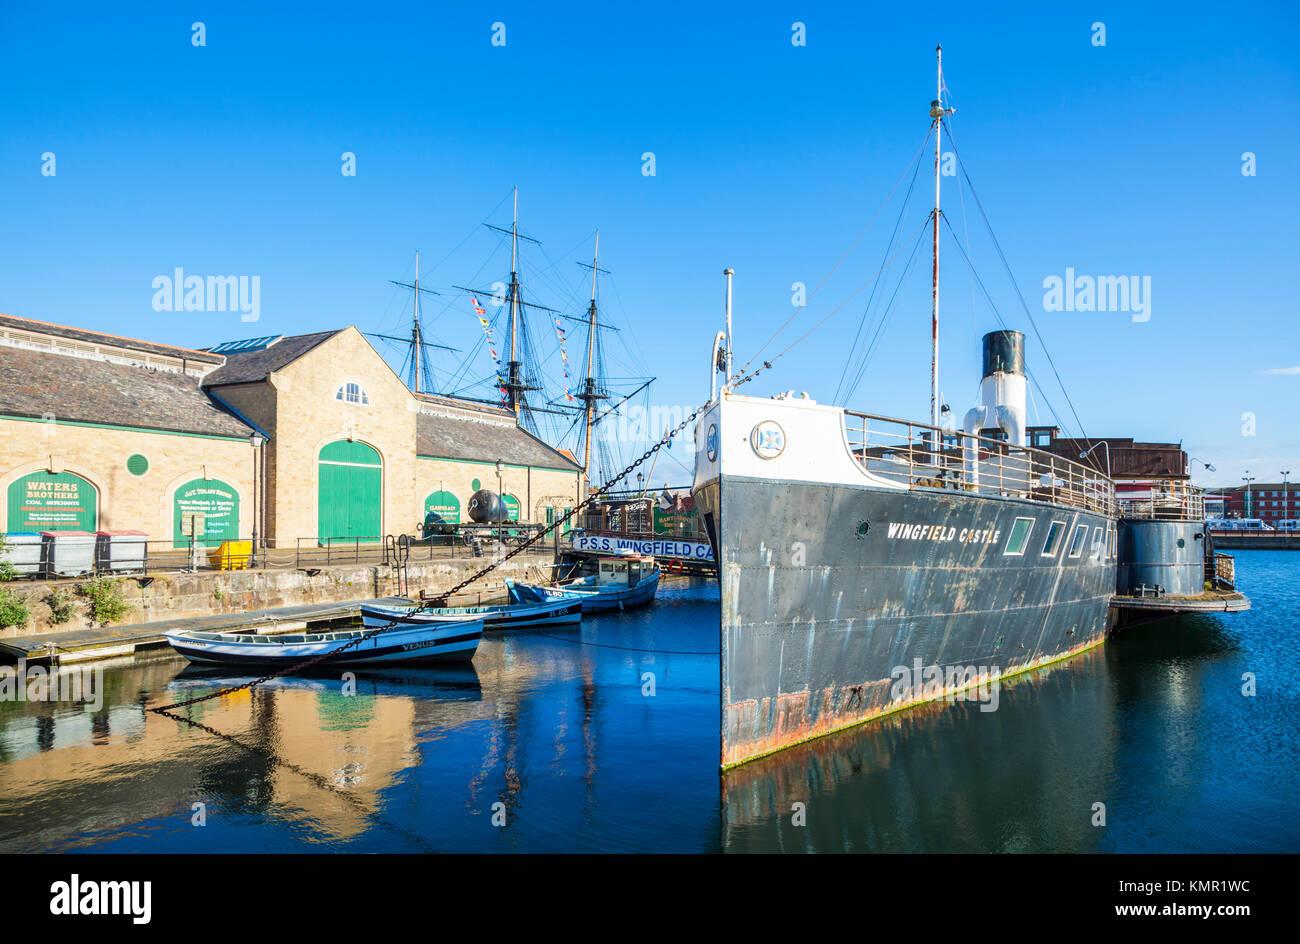 England Hartlepool, England National Museum der Royal Navy Historic Dockyard Hartlepool Marina hartlepool County Stockbild